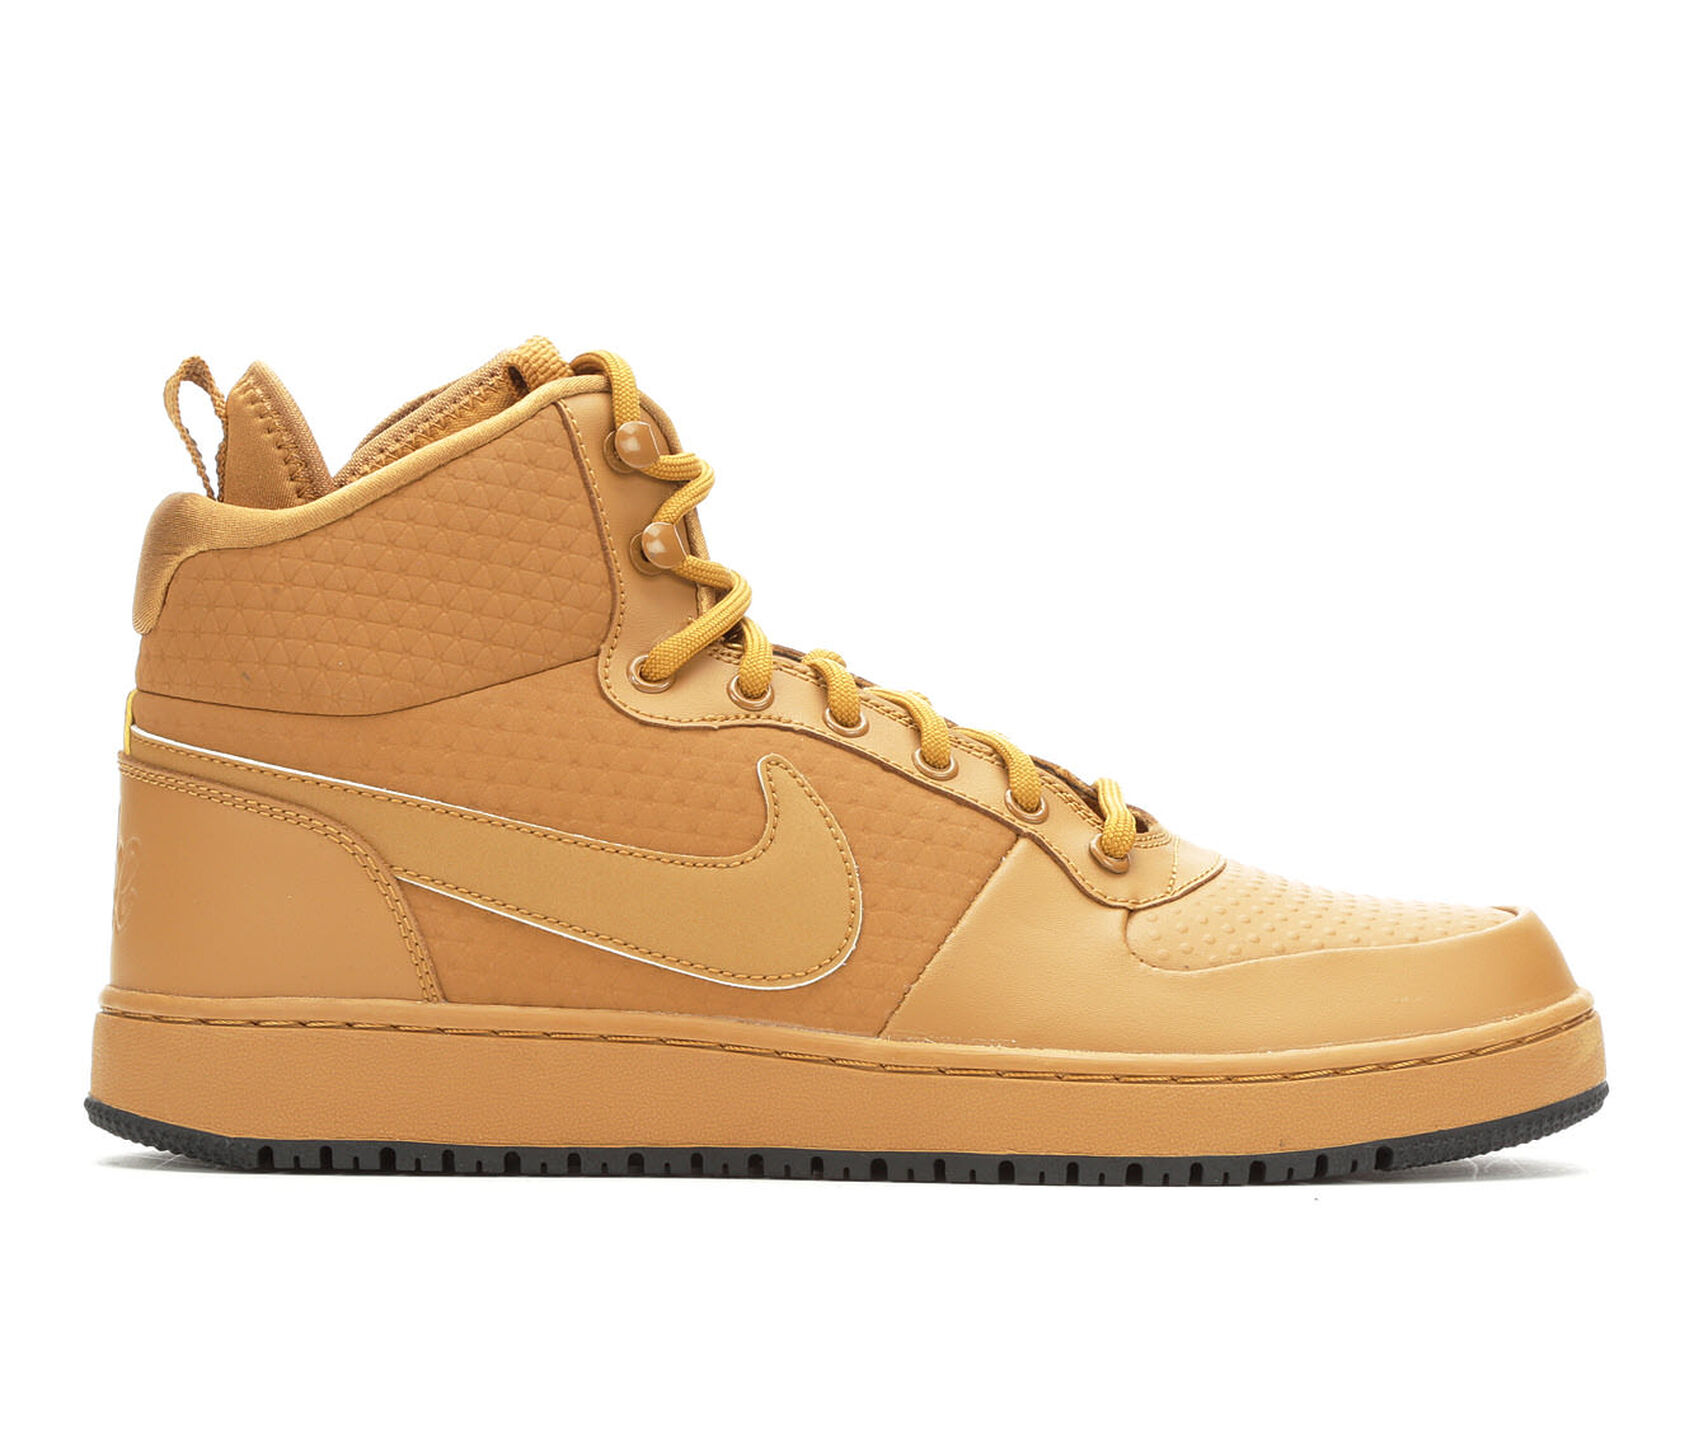 38e2bf7ac3 ... Nike Ebernon Mid SE Sneakers. Previous